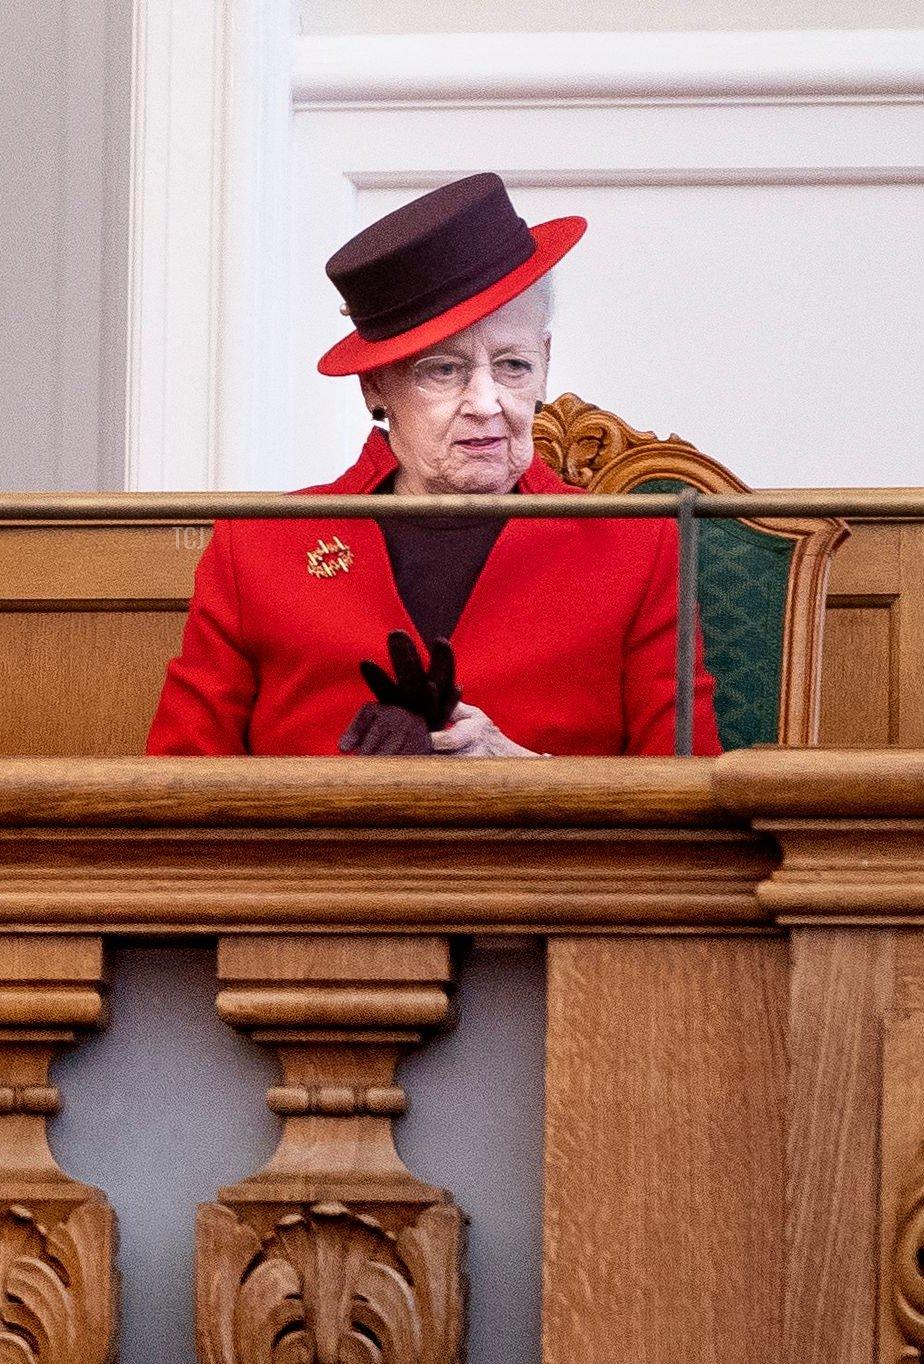 Queen Margrethe II of Denmark during the opening of the Danish Parliament Folketinget in Copenhagen, Denmark, on October 5, 2021